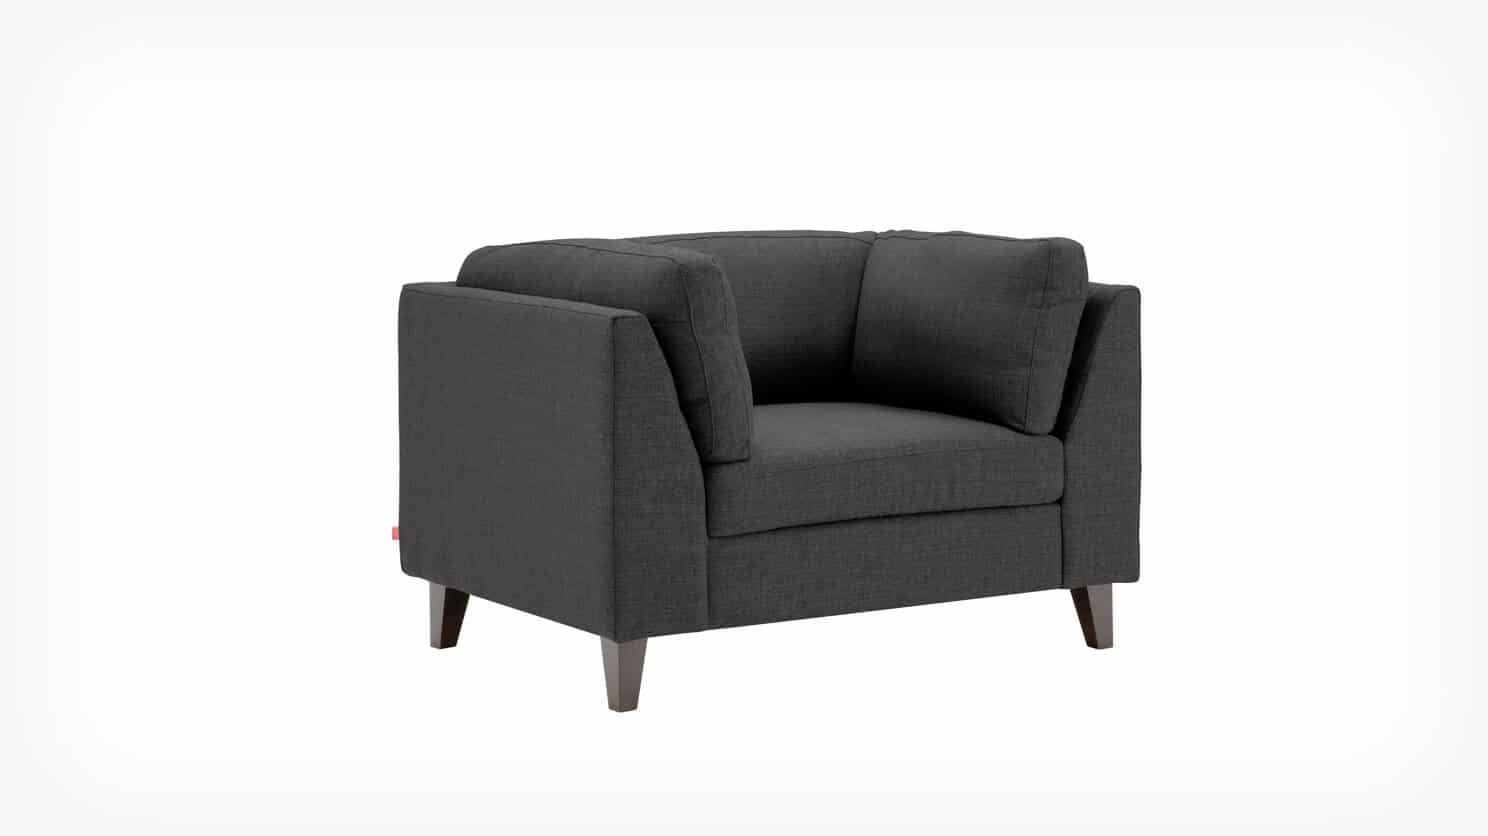 30024 02 2 chairs salema chair polo slate corner